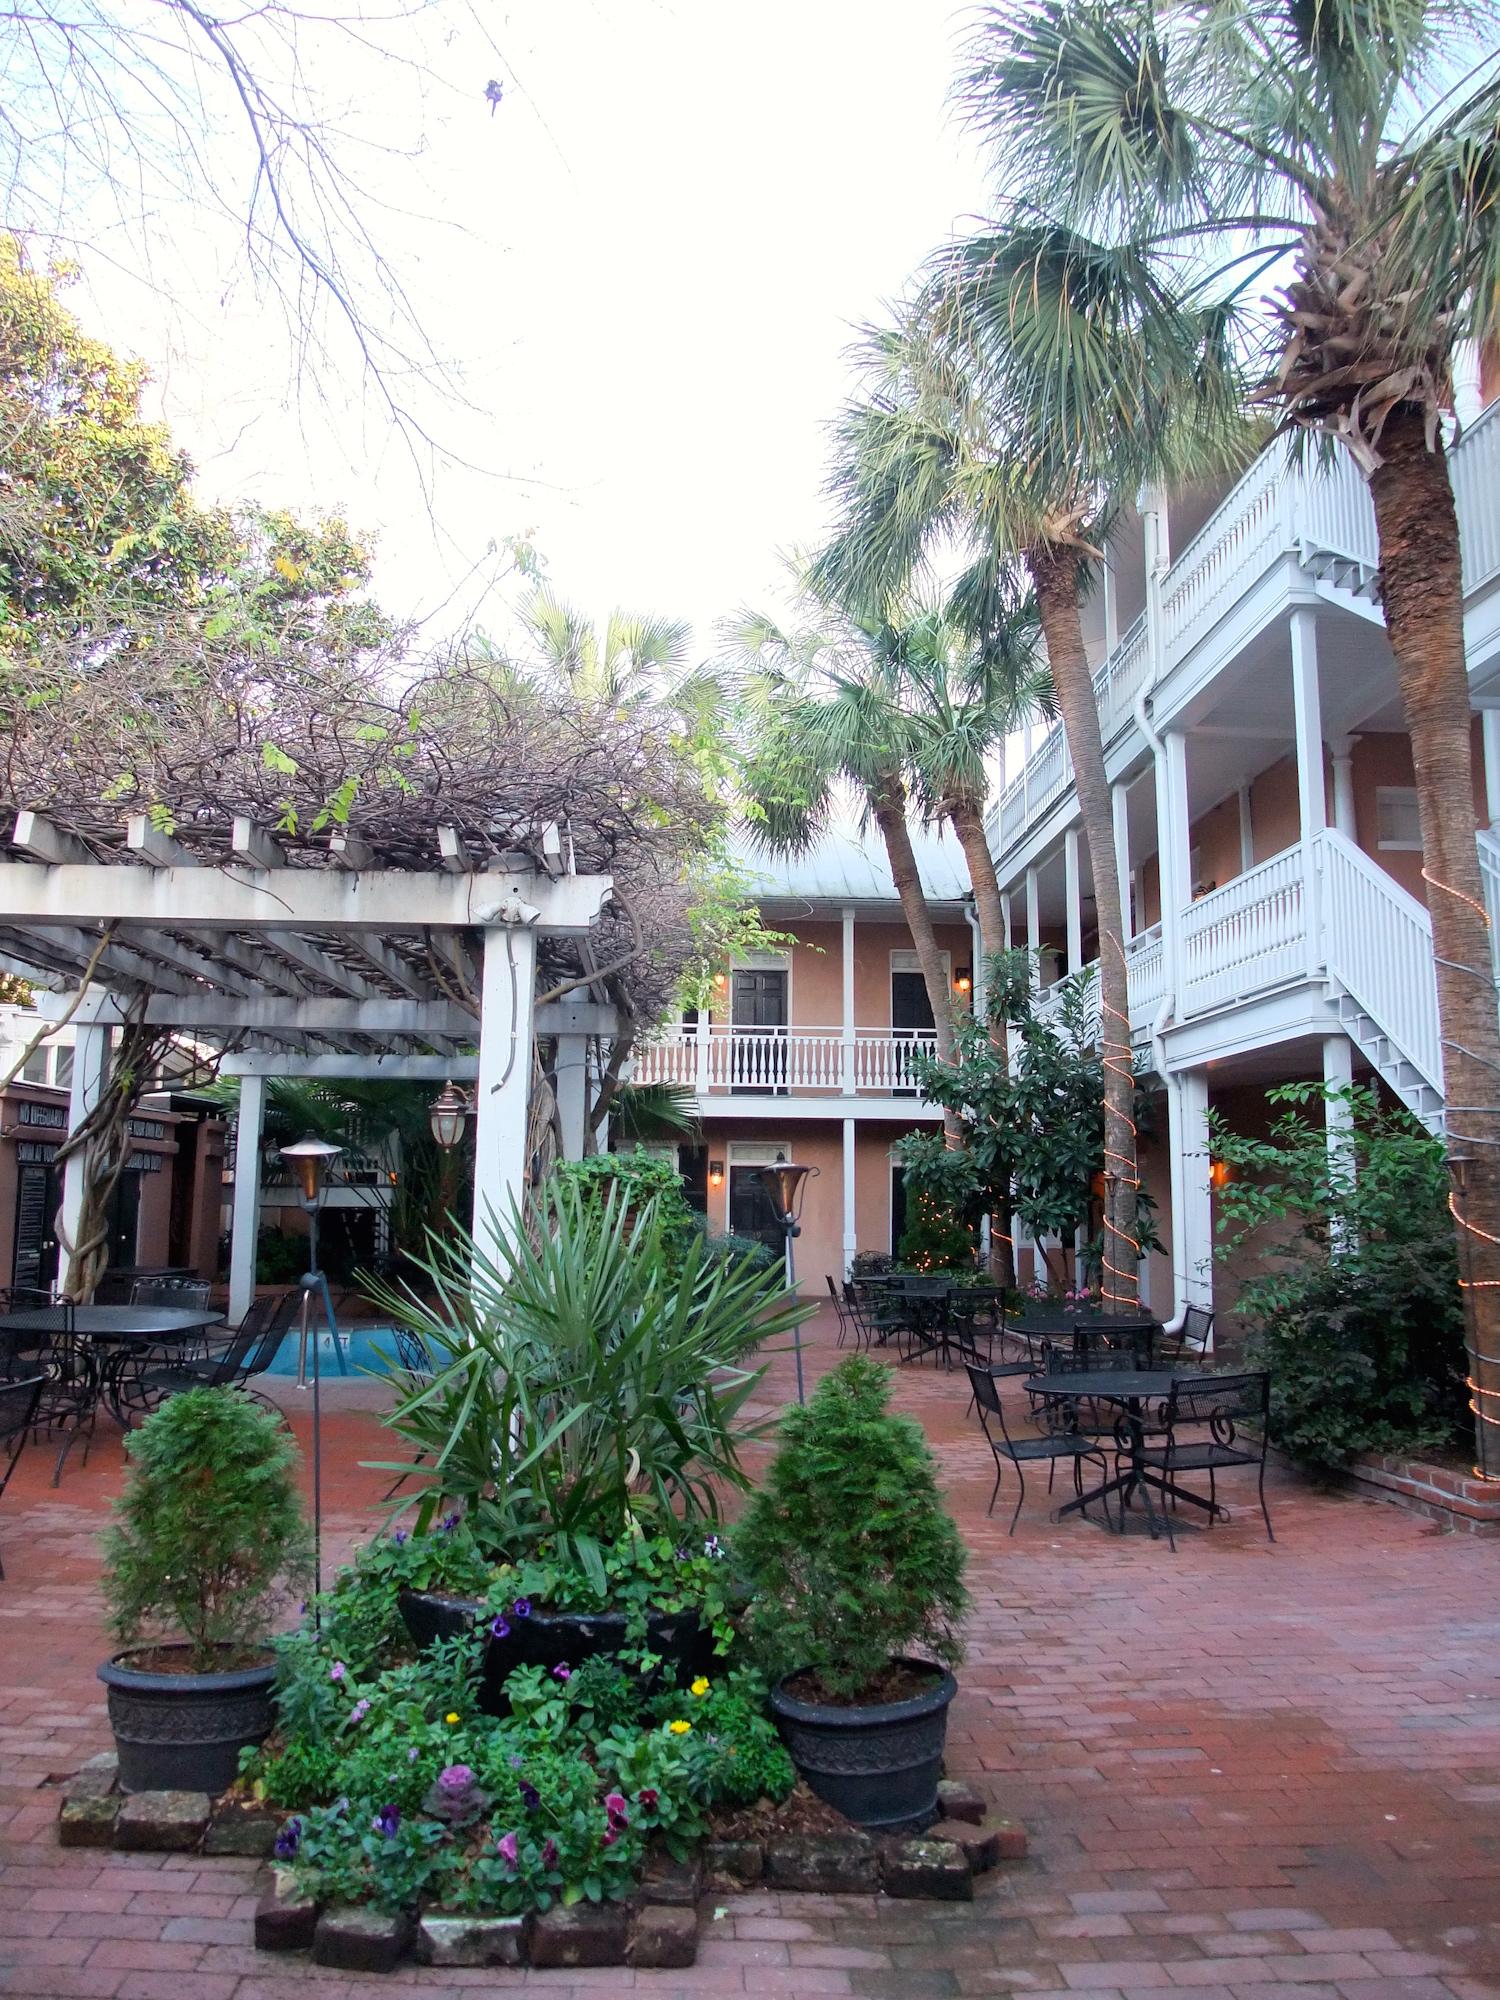 The courtyard inside the Elliot House